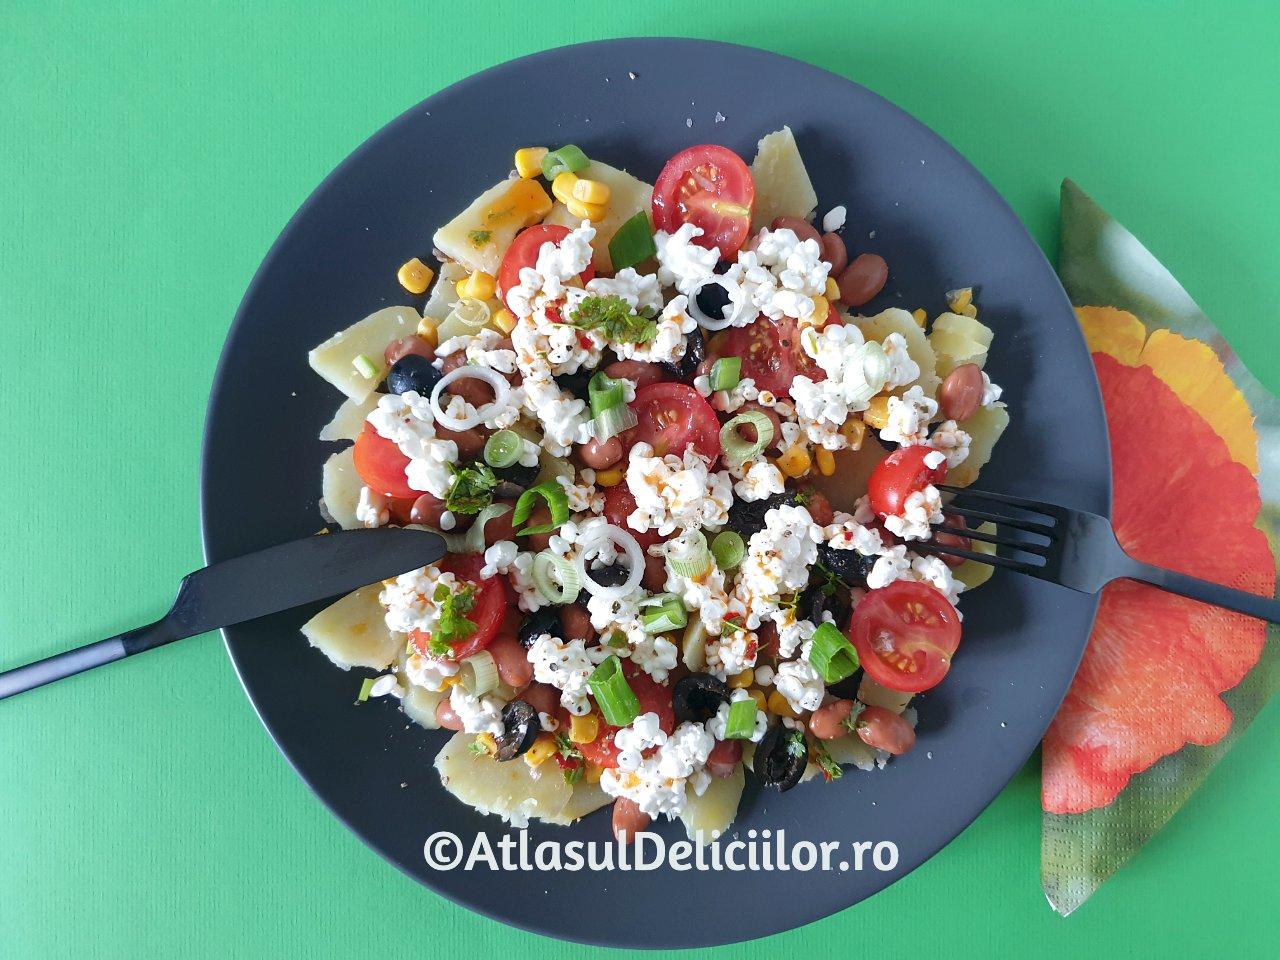 Portie de salata de cartofi Solterito